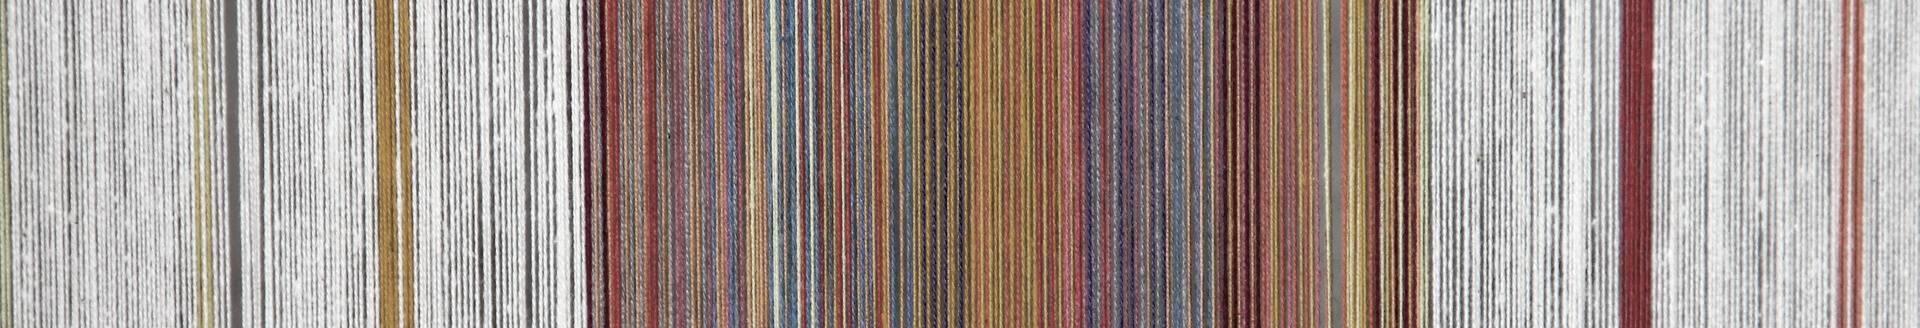 Venta de hilo de poliéster texturado para coser especial remalladora